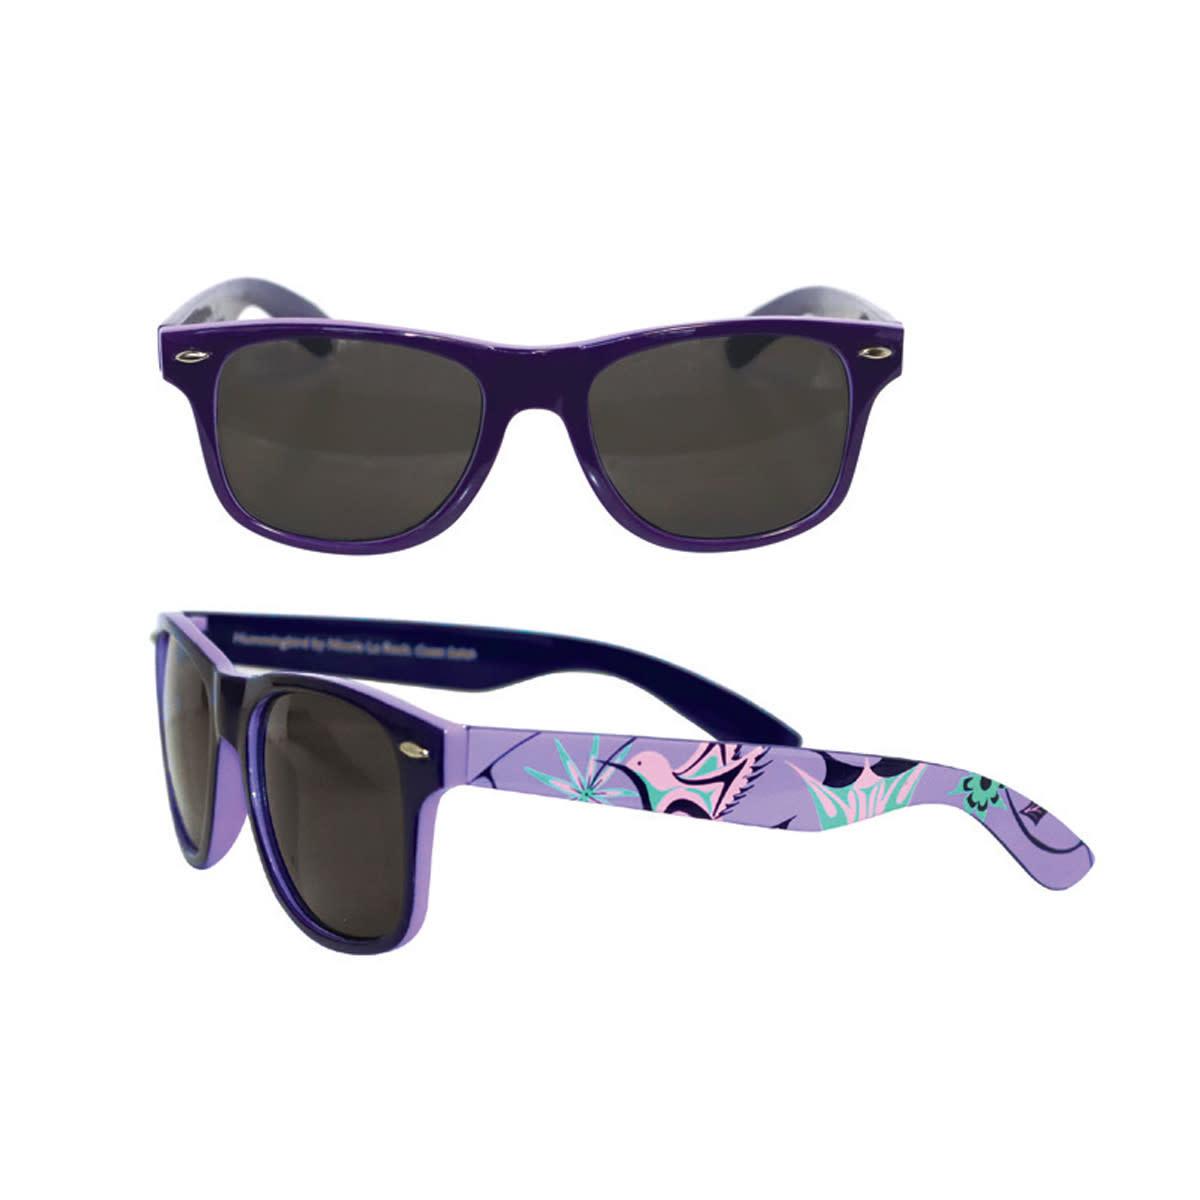 SunGlasses - Adult-2